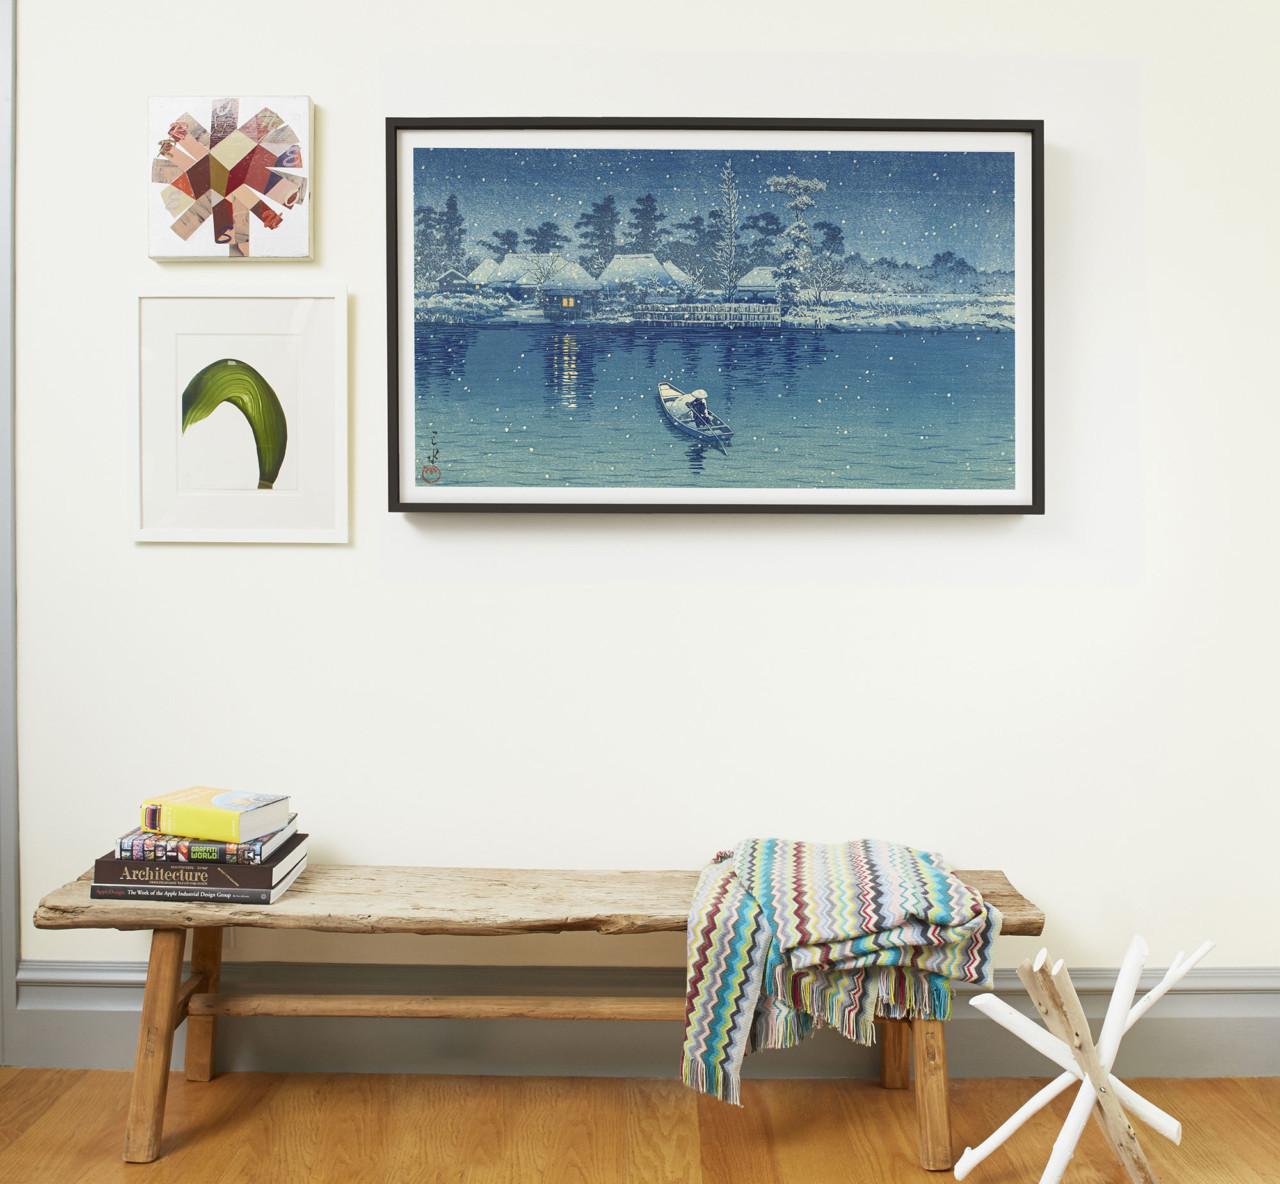 The Depict Frame Adds a Twist to Digital Art Canvas - Design Milk